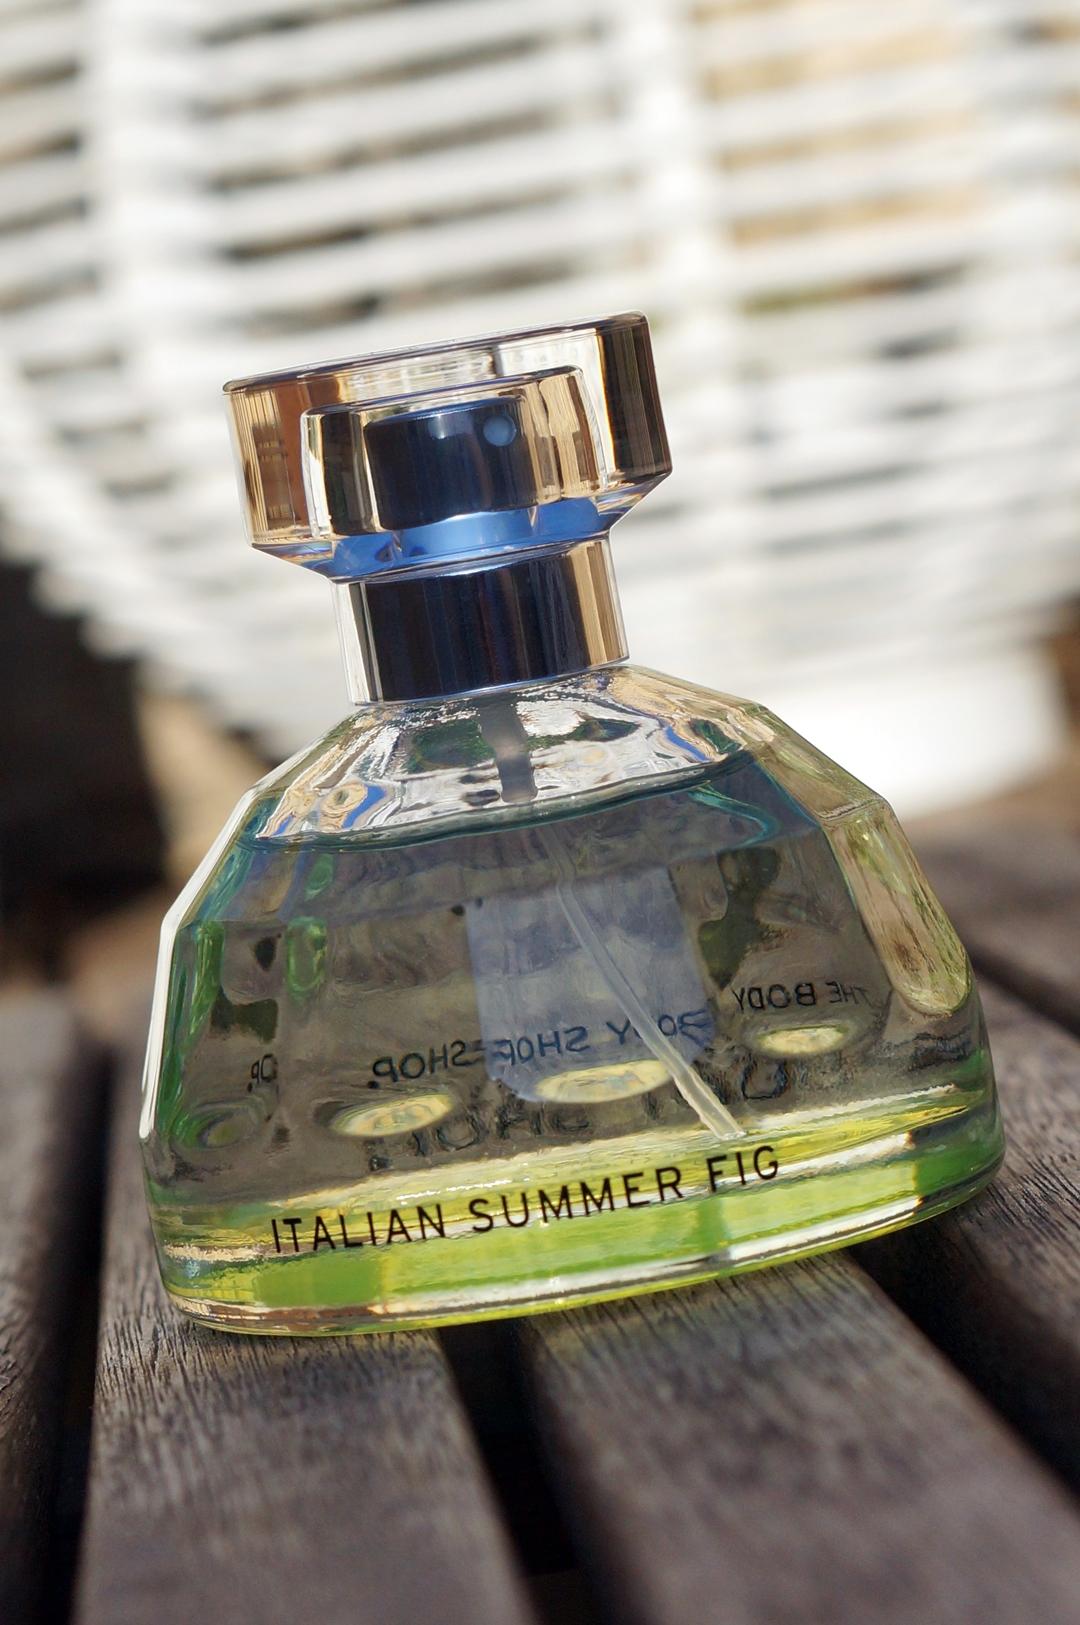 the-body-shop-italian-summer-fig-eau-de-toilette (5)